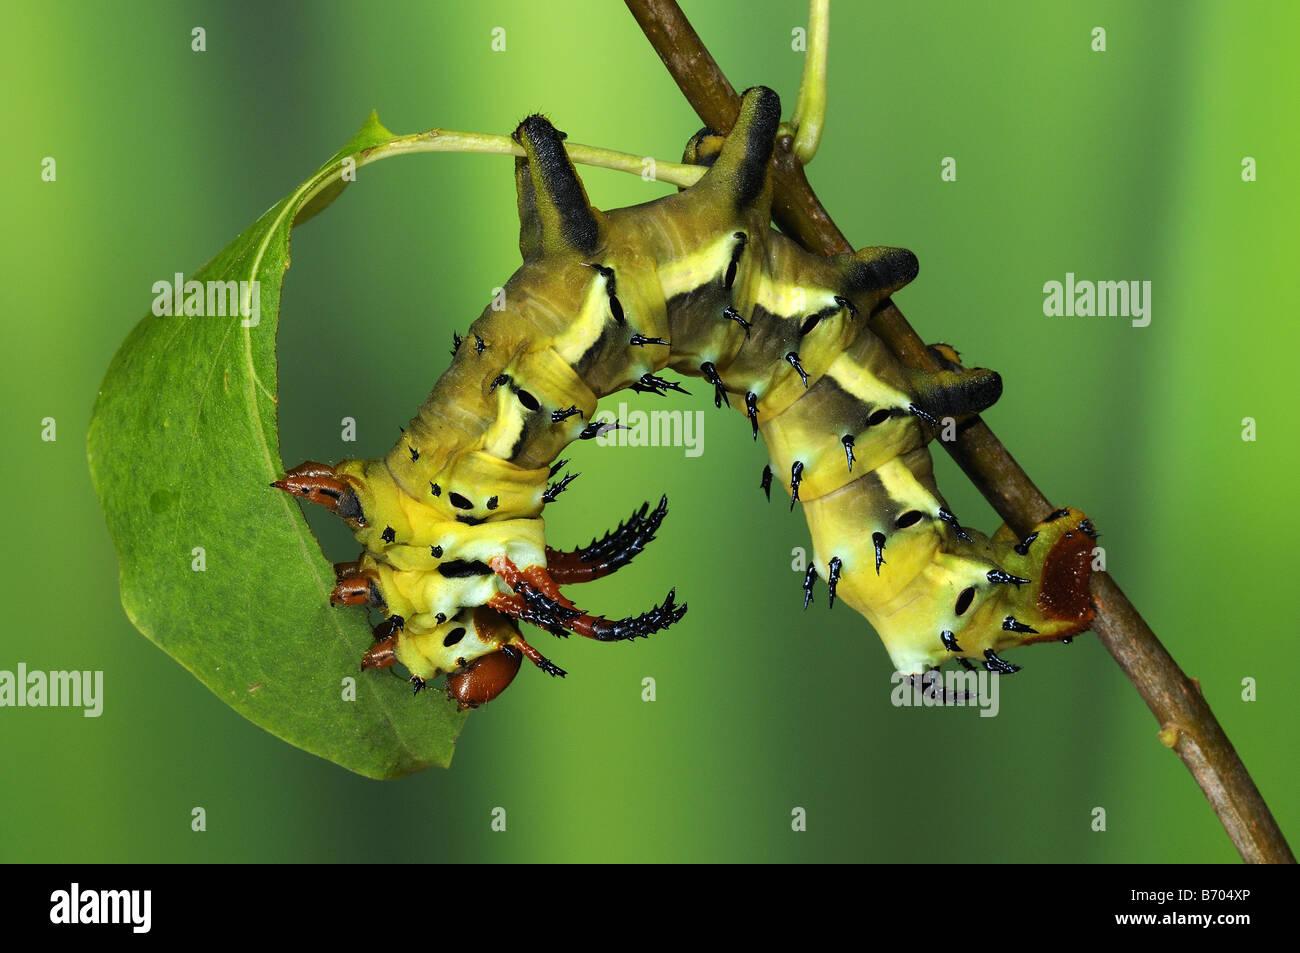 Regal Silkmoth Citheronia regalis final instar larva feeding on Lilac leaf captive bred - Stock Image